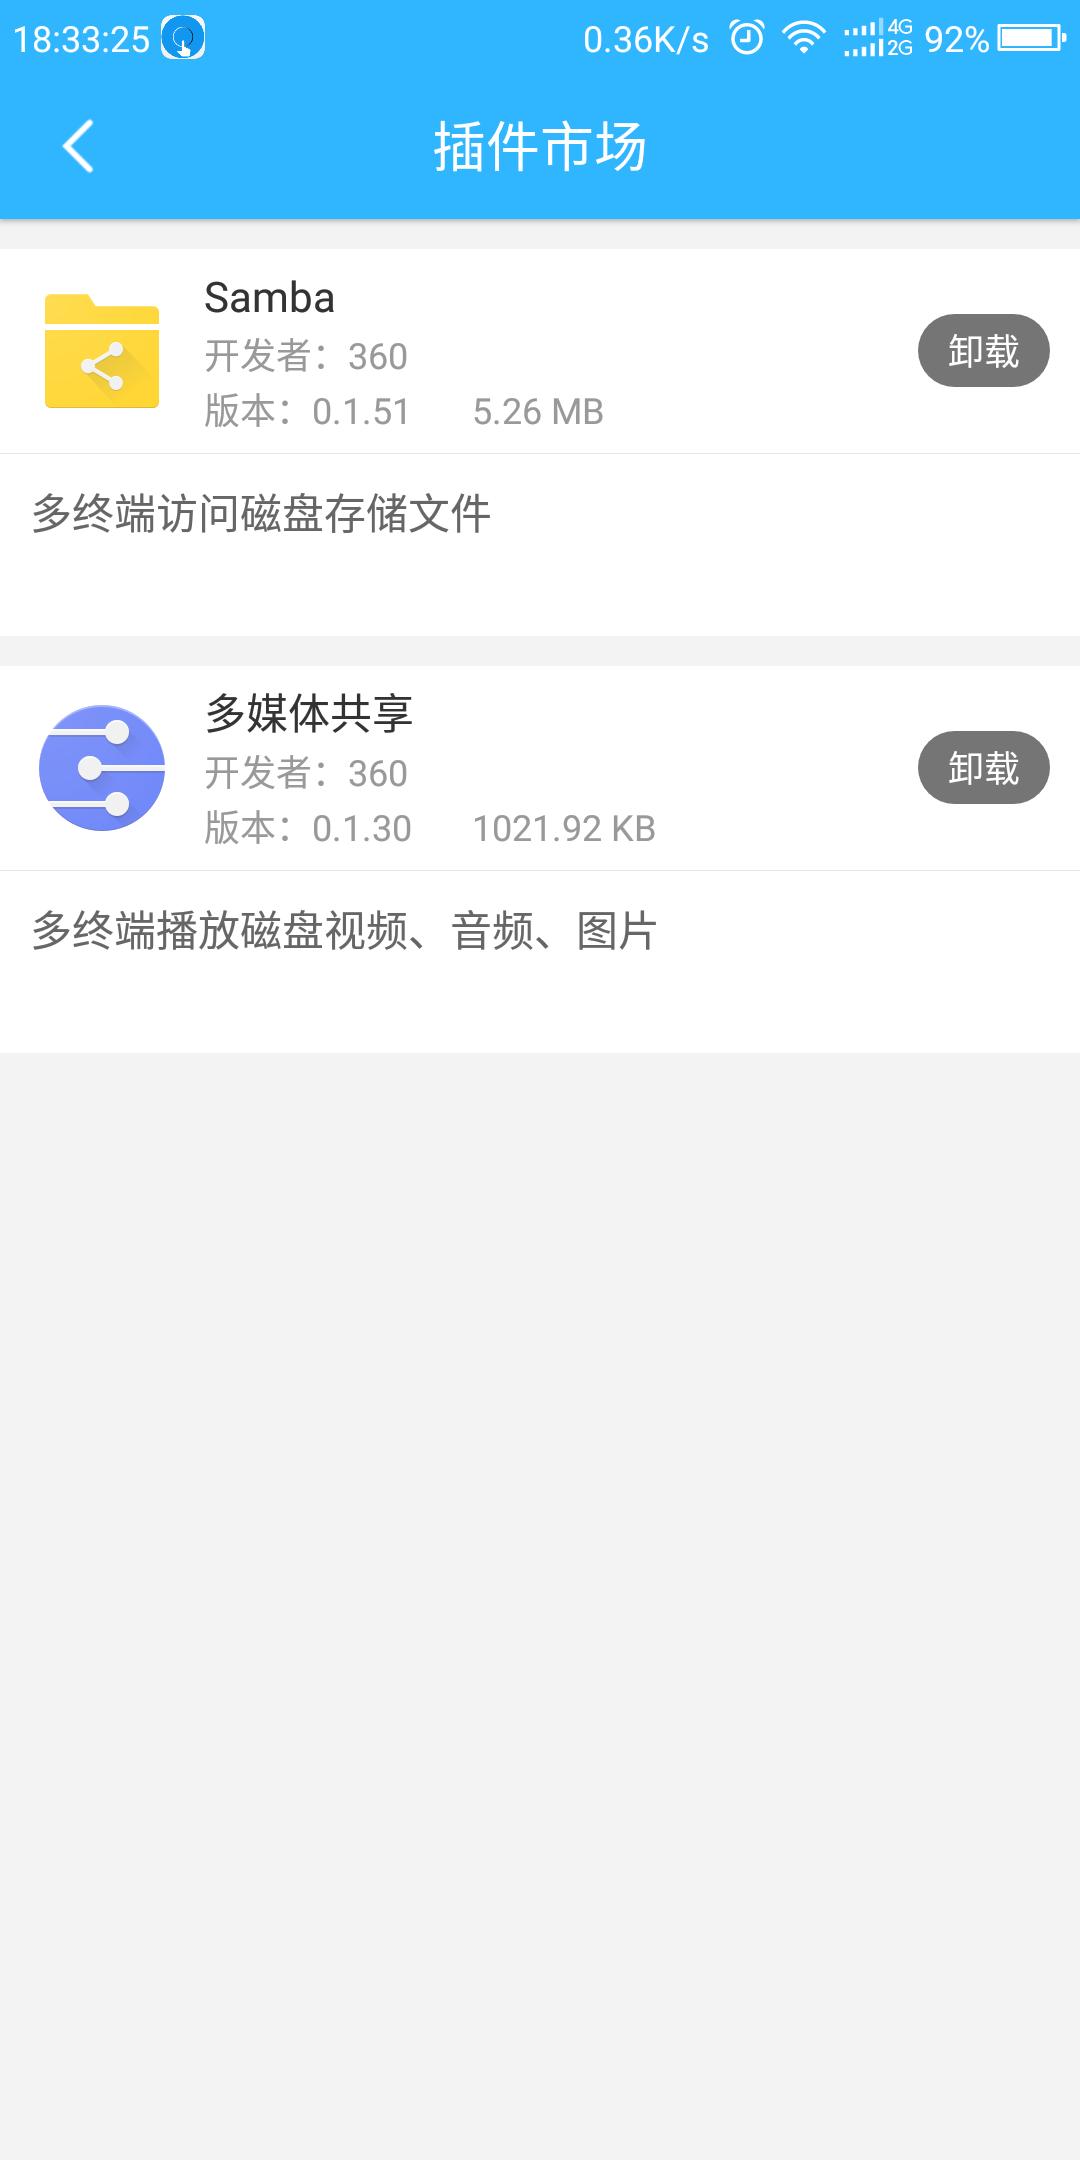 Screenshot_2018-06-11-18-33-26.png